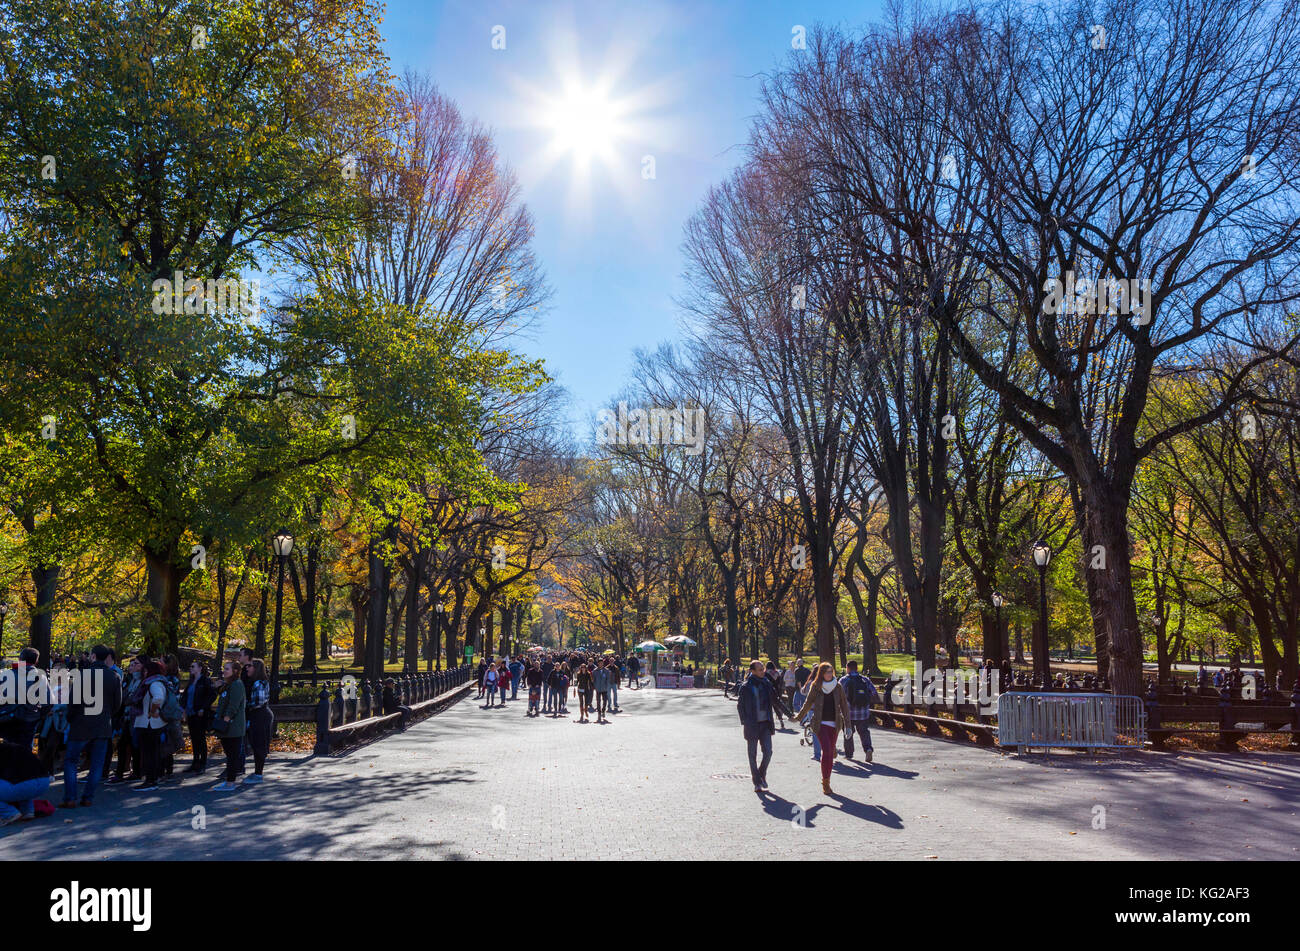 El Mall, Central Park, New York City, NY, EE.UU. Imagen De Stock